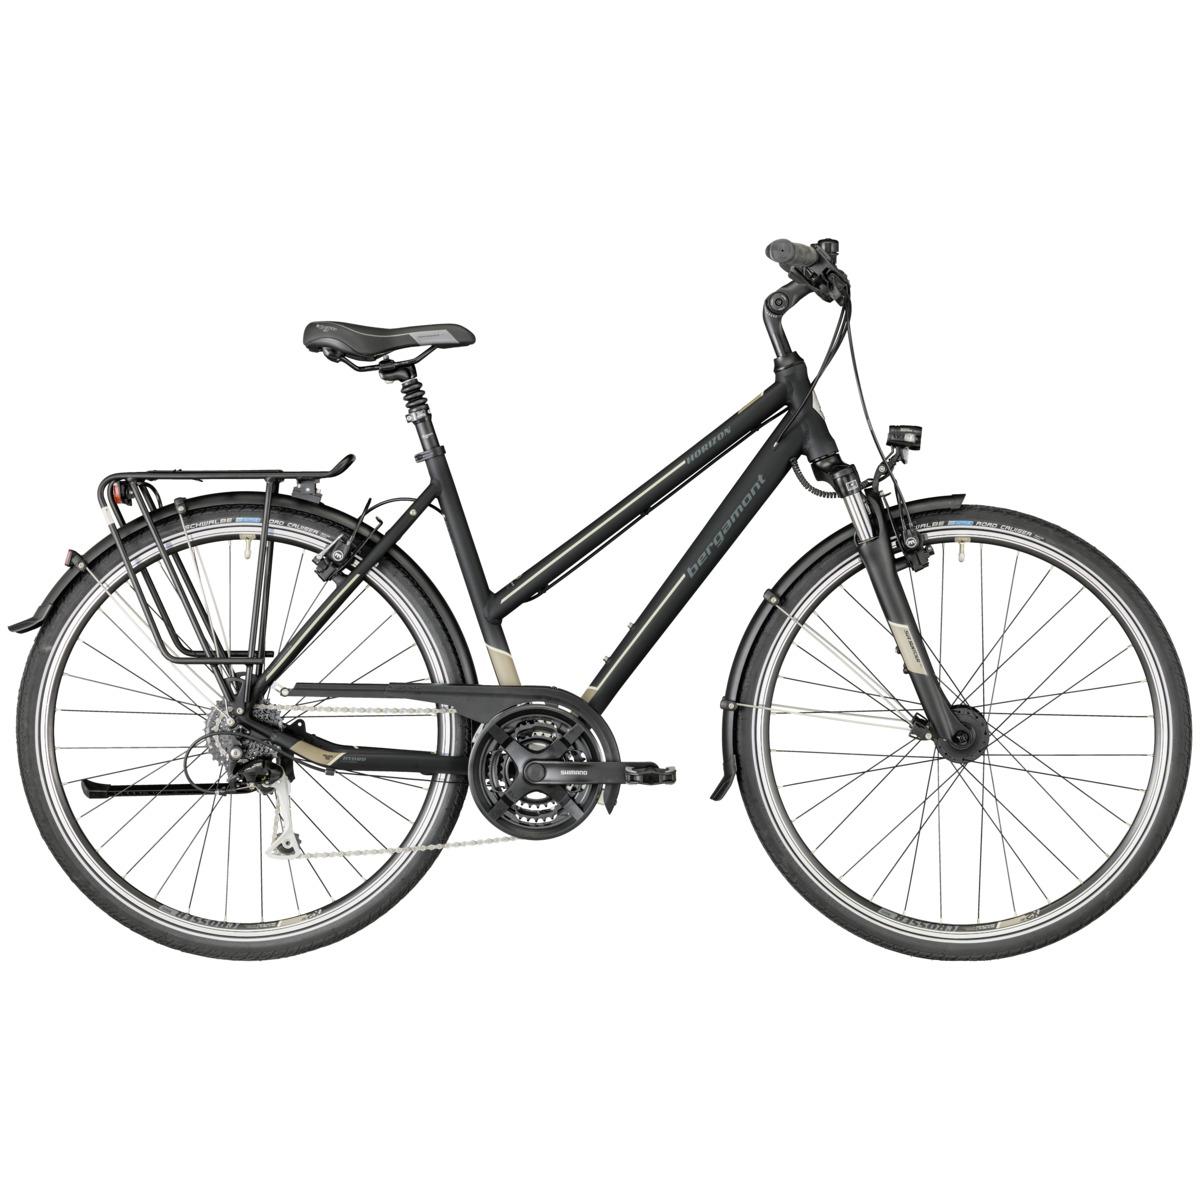 bergamont horizon 5 0 damen trekking fahrrad schwarz grau. Black Bedroom Furniture Sets. Home Design Ideas